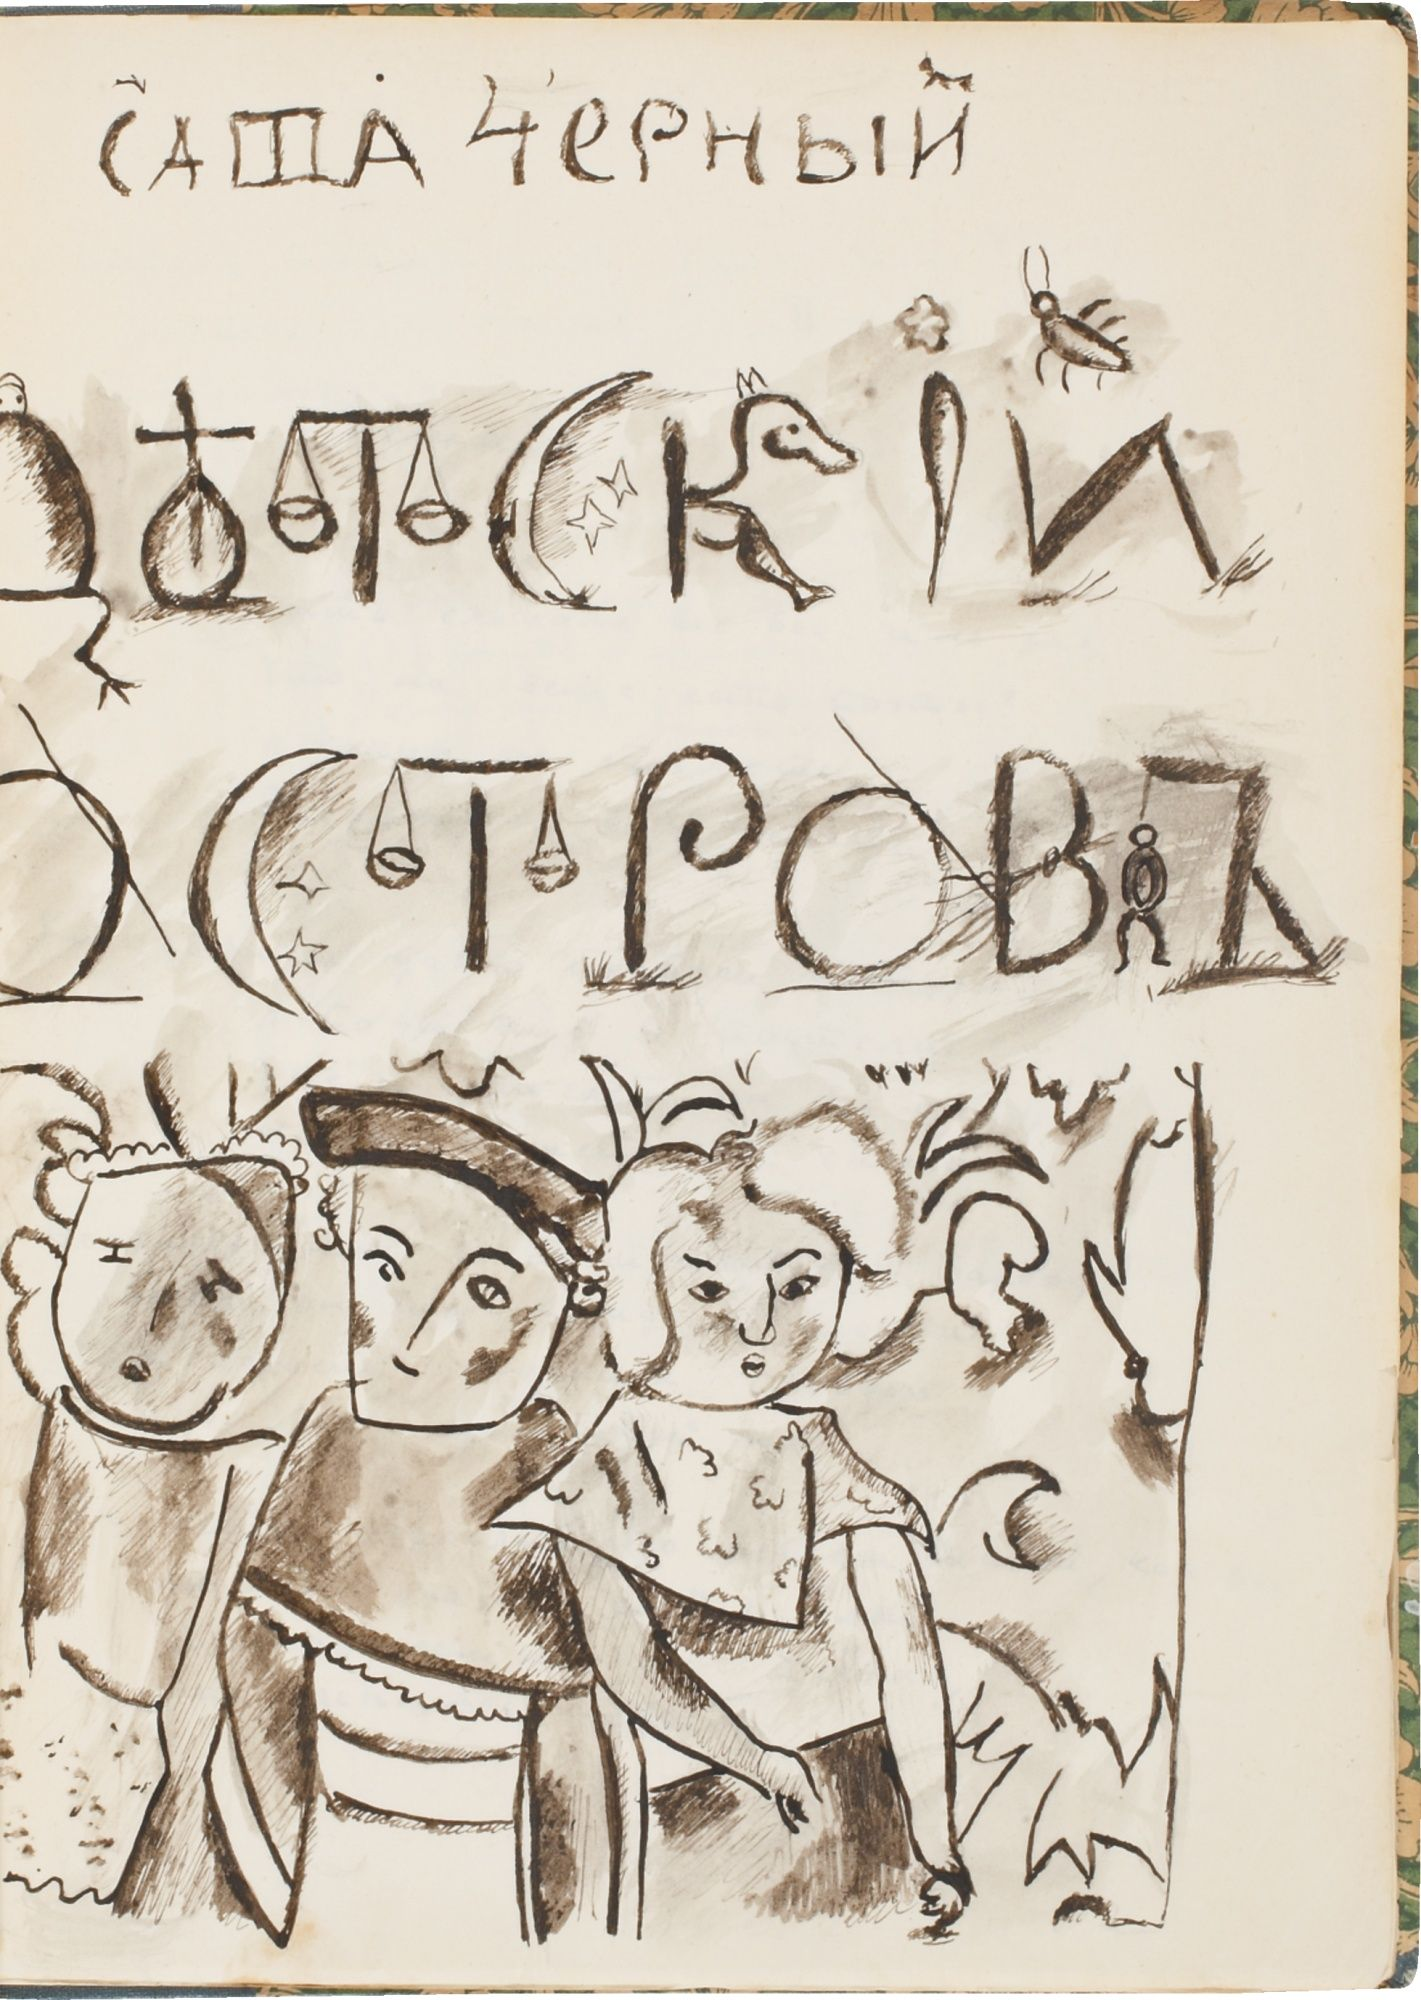 """Detsky ostrov"" Sasha Chorny; Boris Grigoriev (drawings); N.p. [Berlin?], ca. 1920-22"